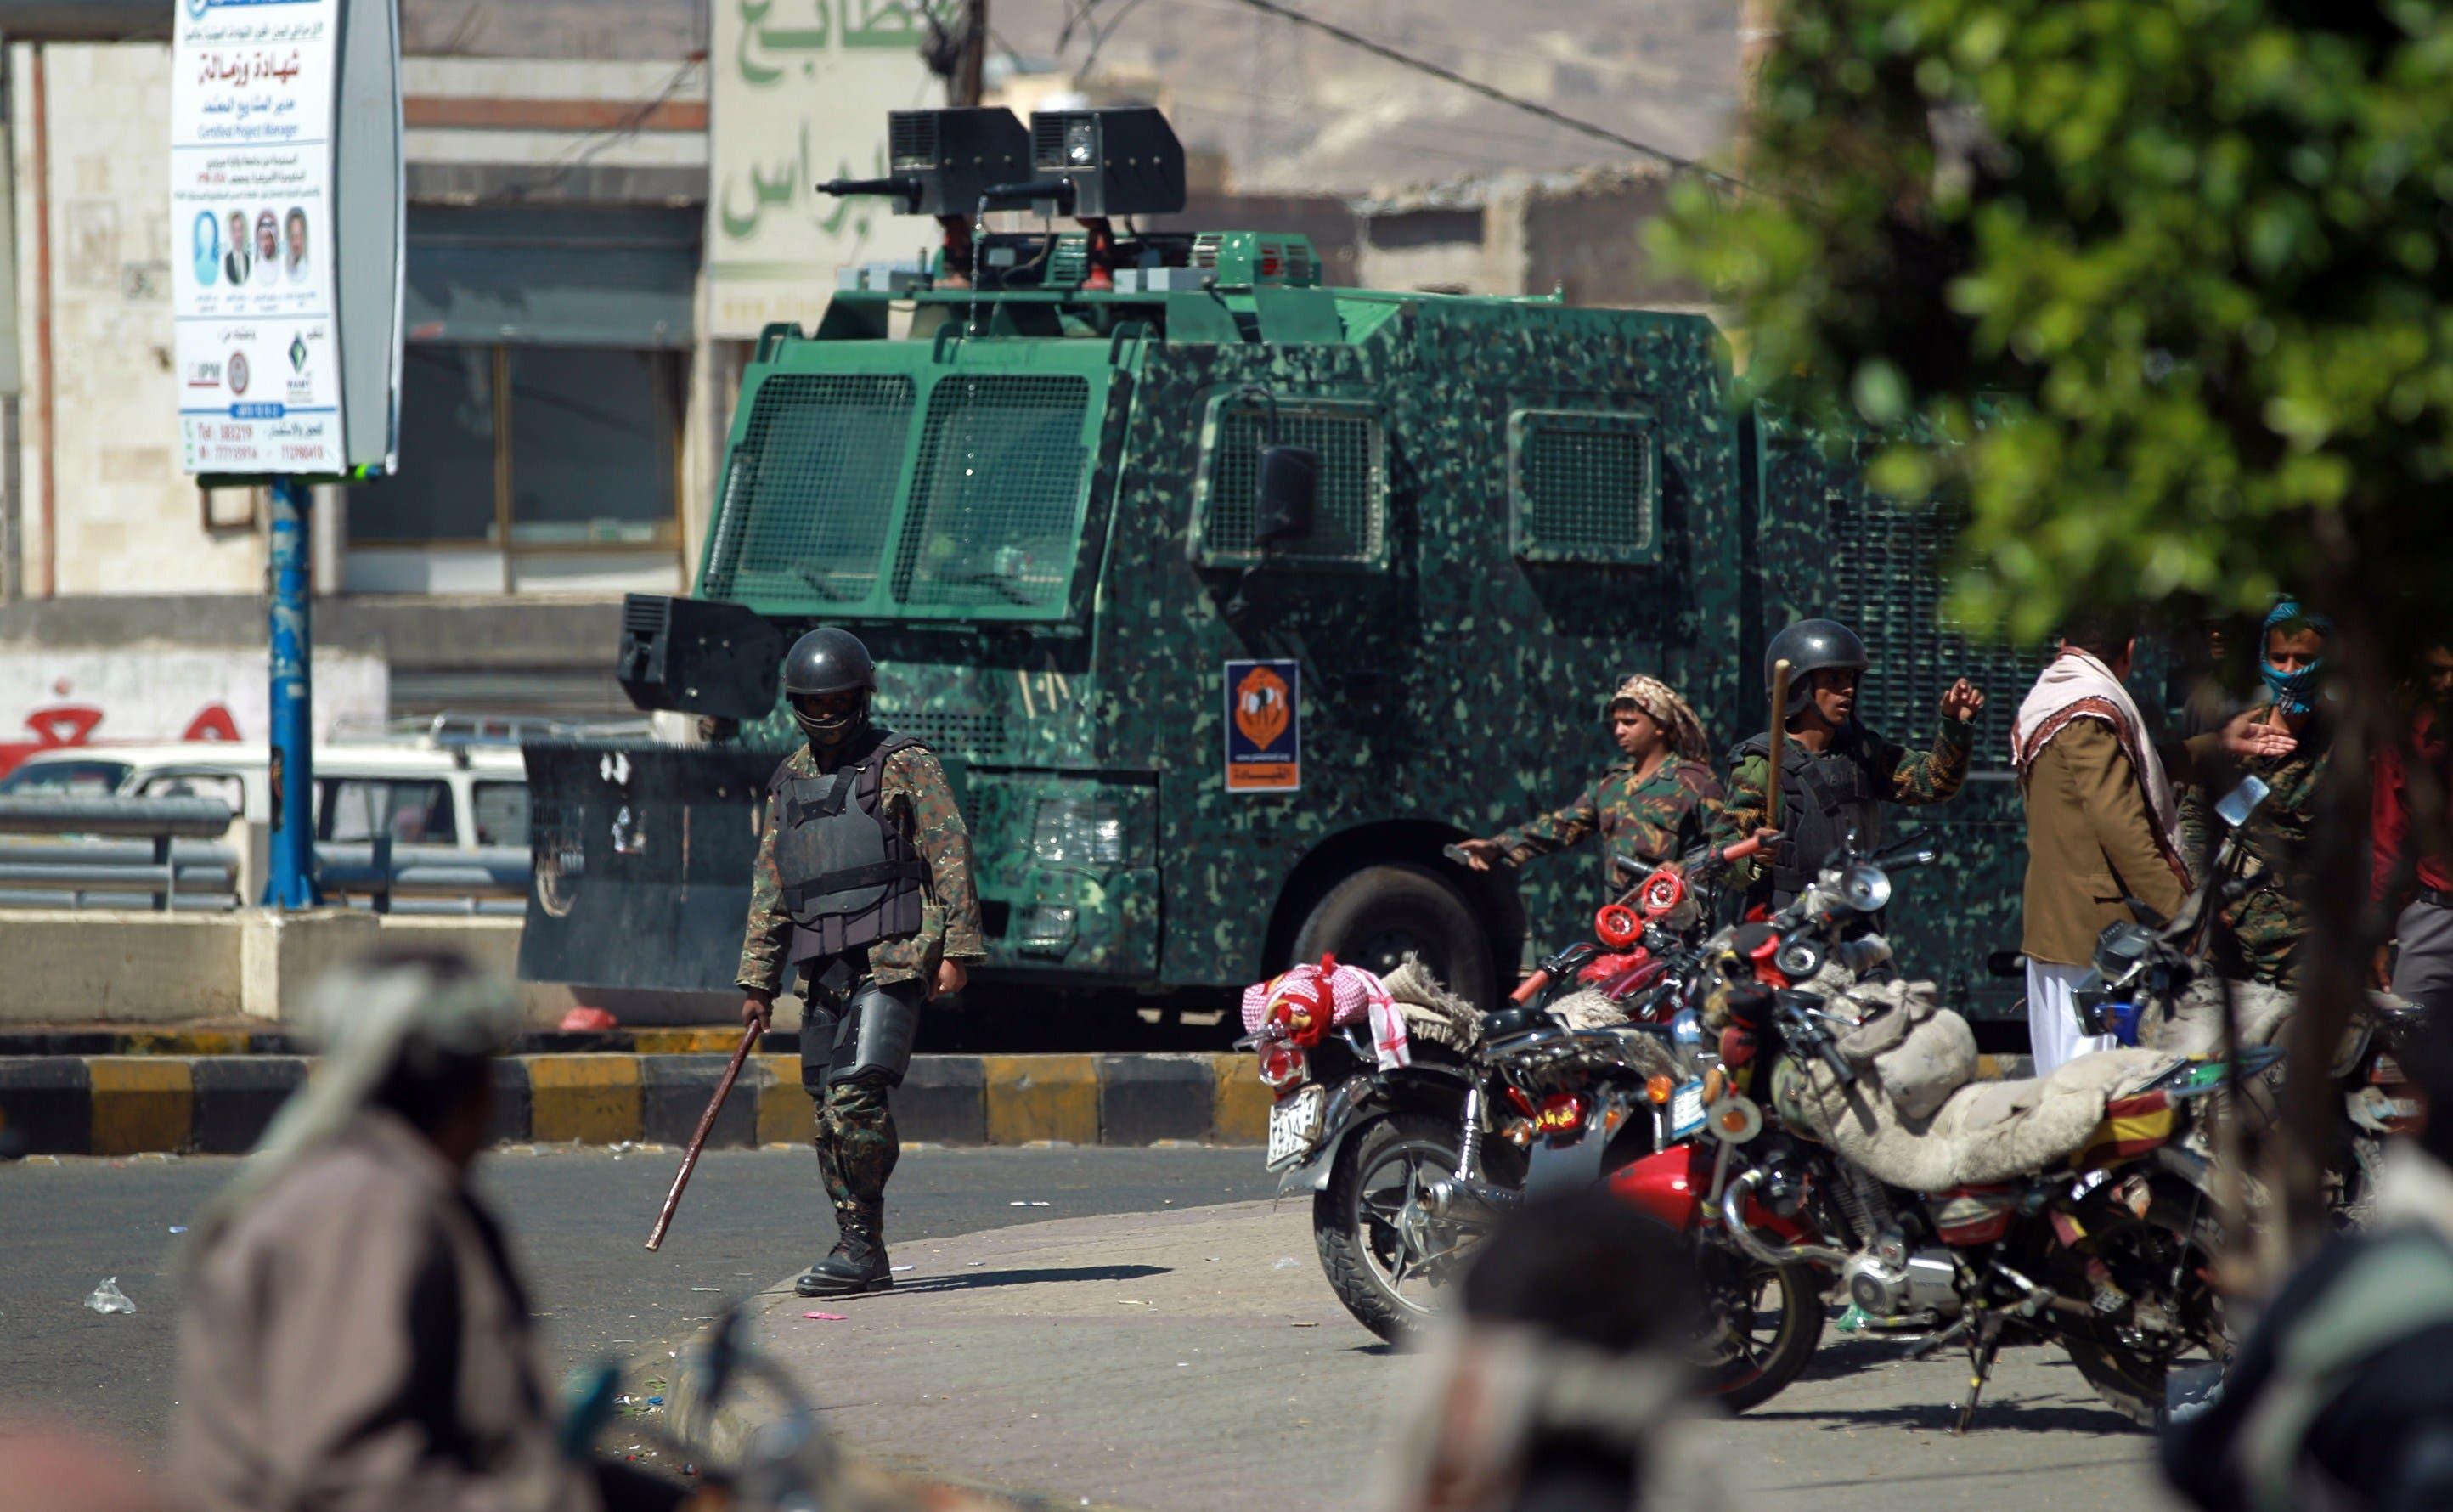 Banning motorbikes in Sana'a